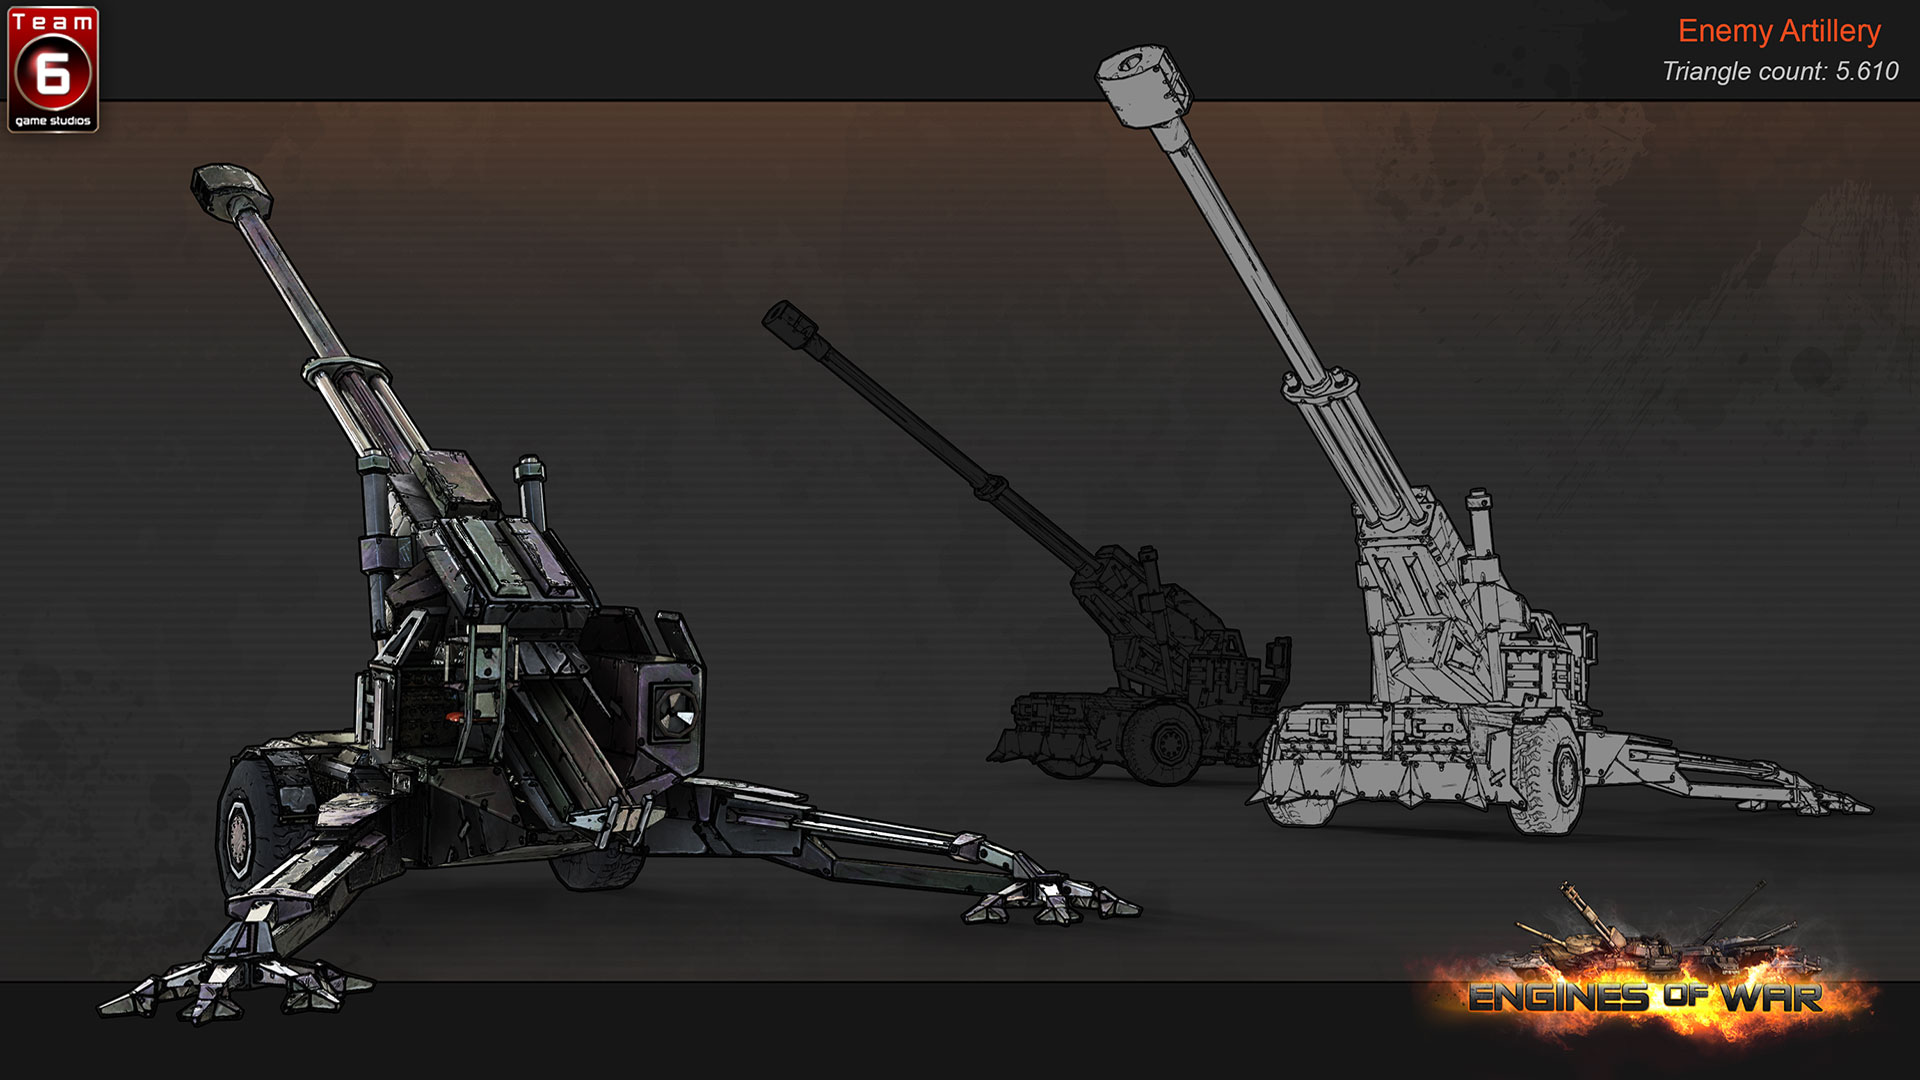 Enemy_Artillery_EnginesOfWar